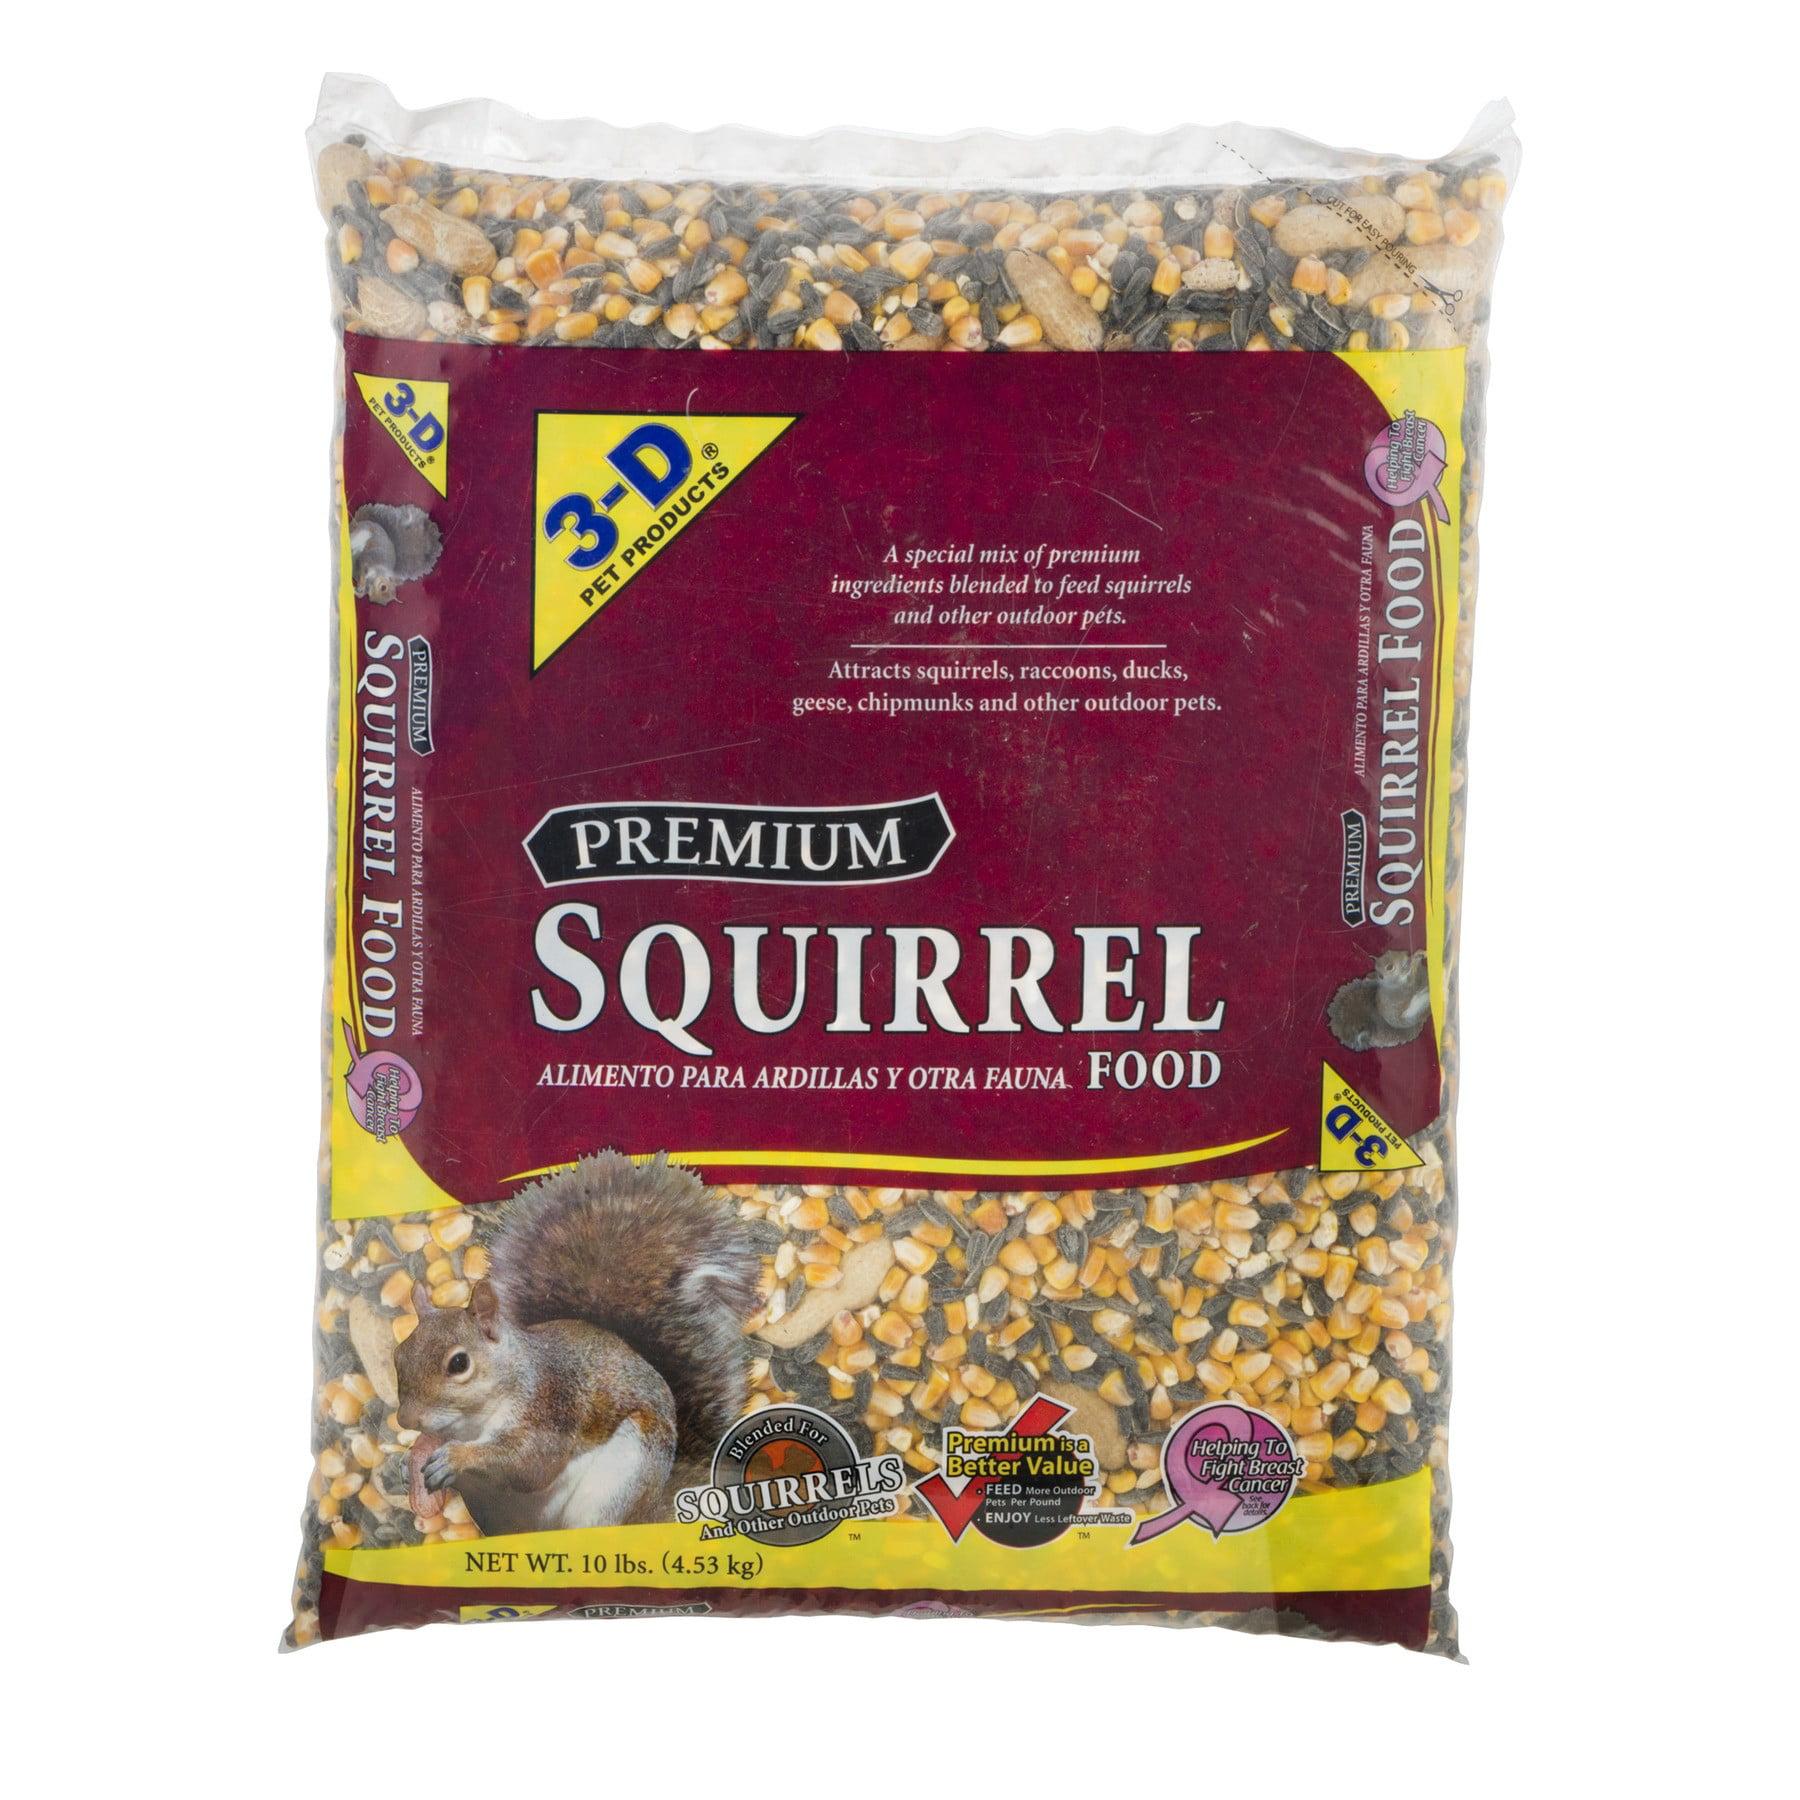 3-D Pet Products Premium Squirrel Food Dry Squirrel Food, 10 LB by D & D Commodities Ltd.